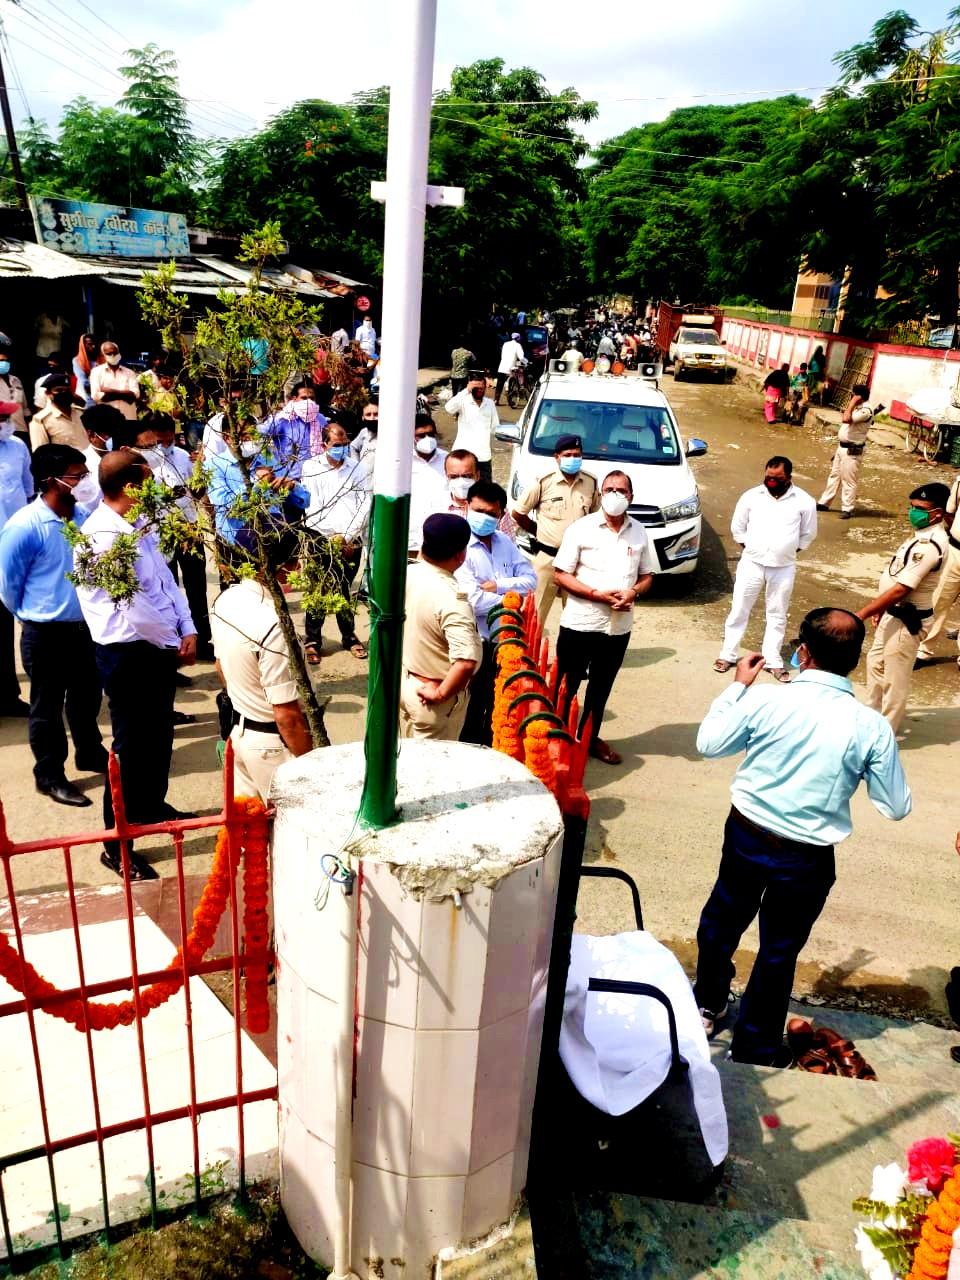 Dr.Bhupendra Madhepuri along with officers at BP Mandal Chowk Madhepura on way to Murho.